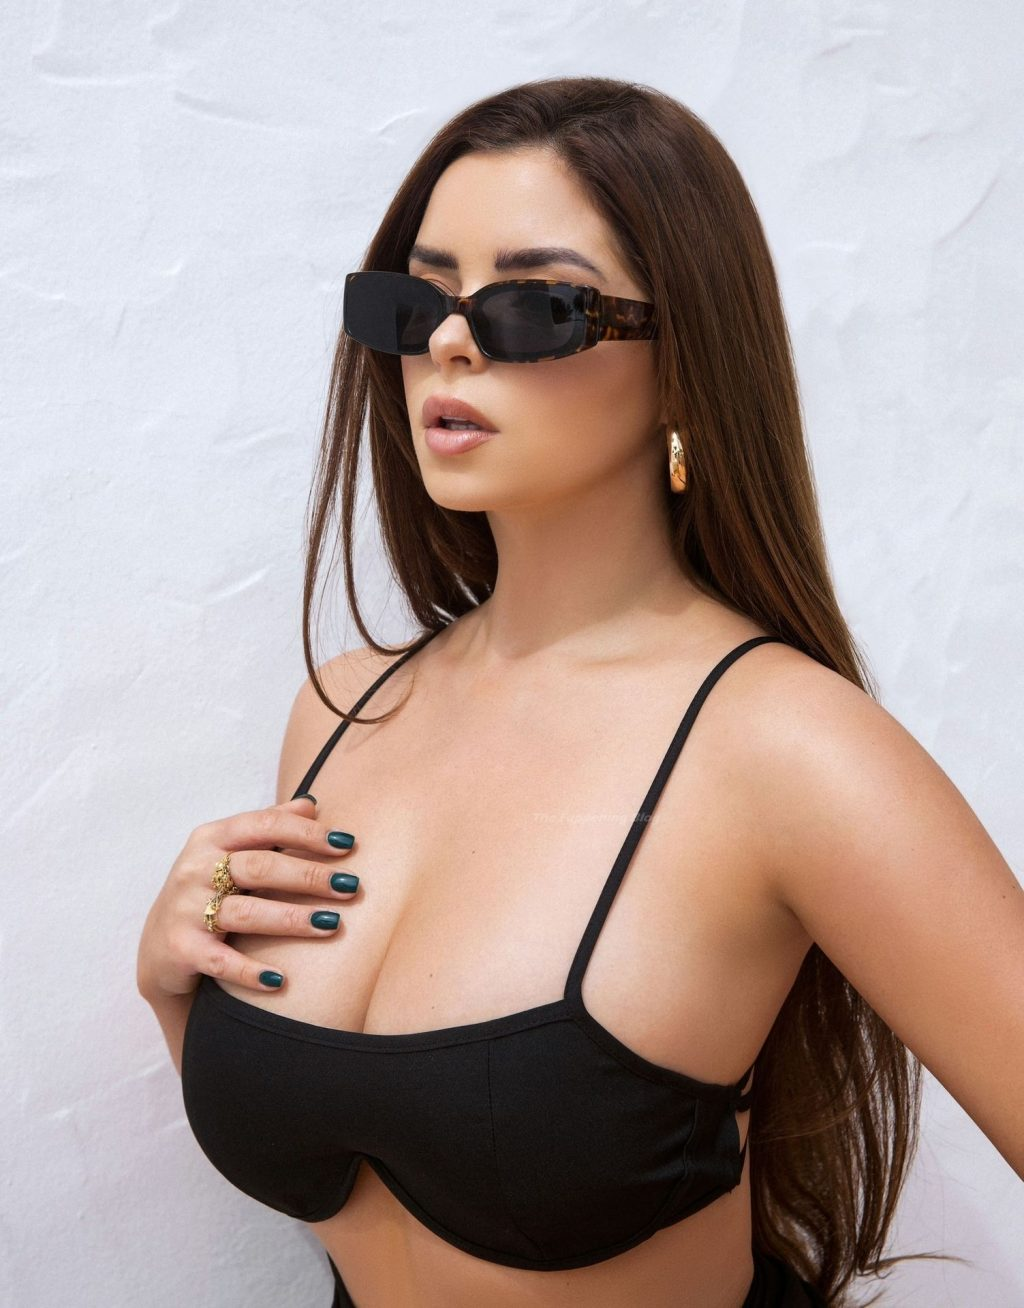 Demi Rose Showcases Her Sexy Voluptuous Figure (16 Photos)